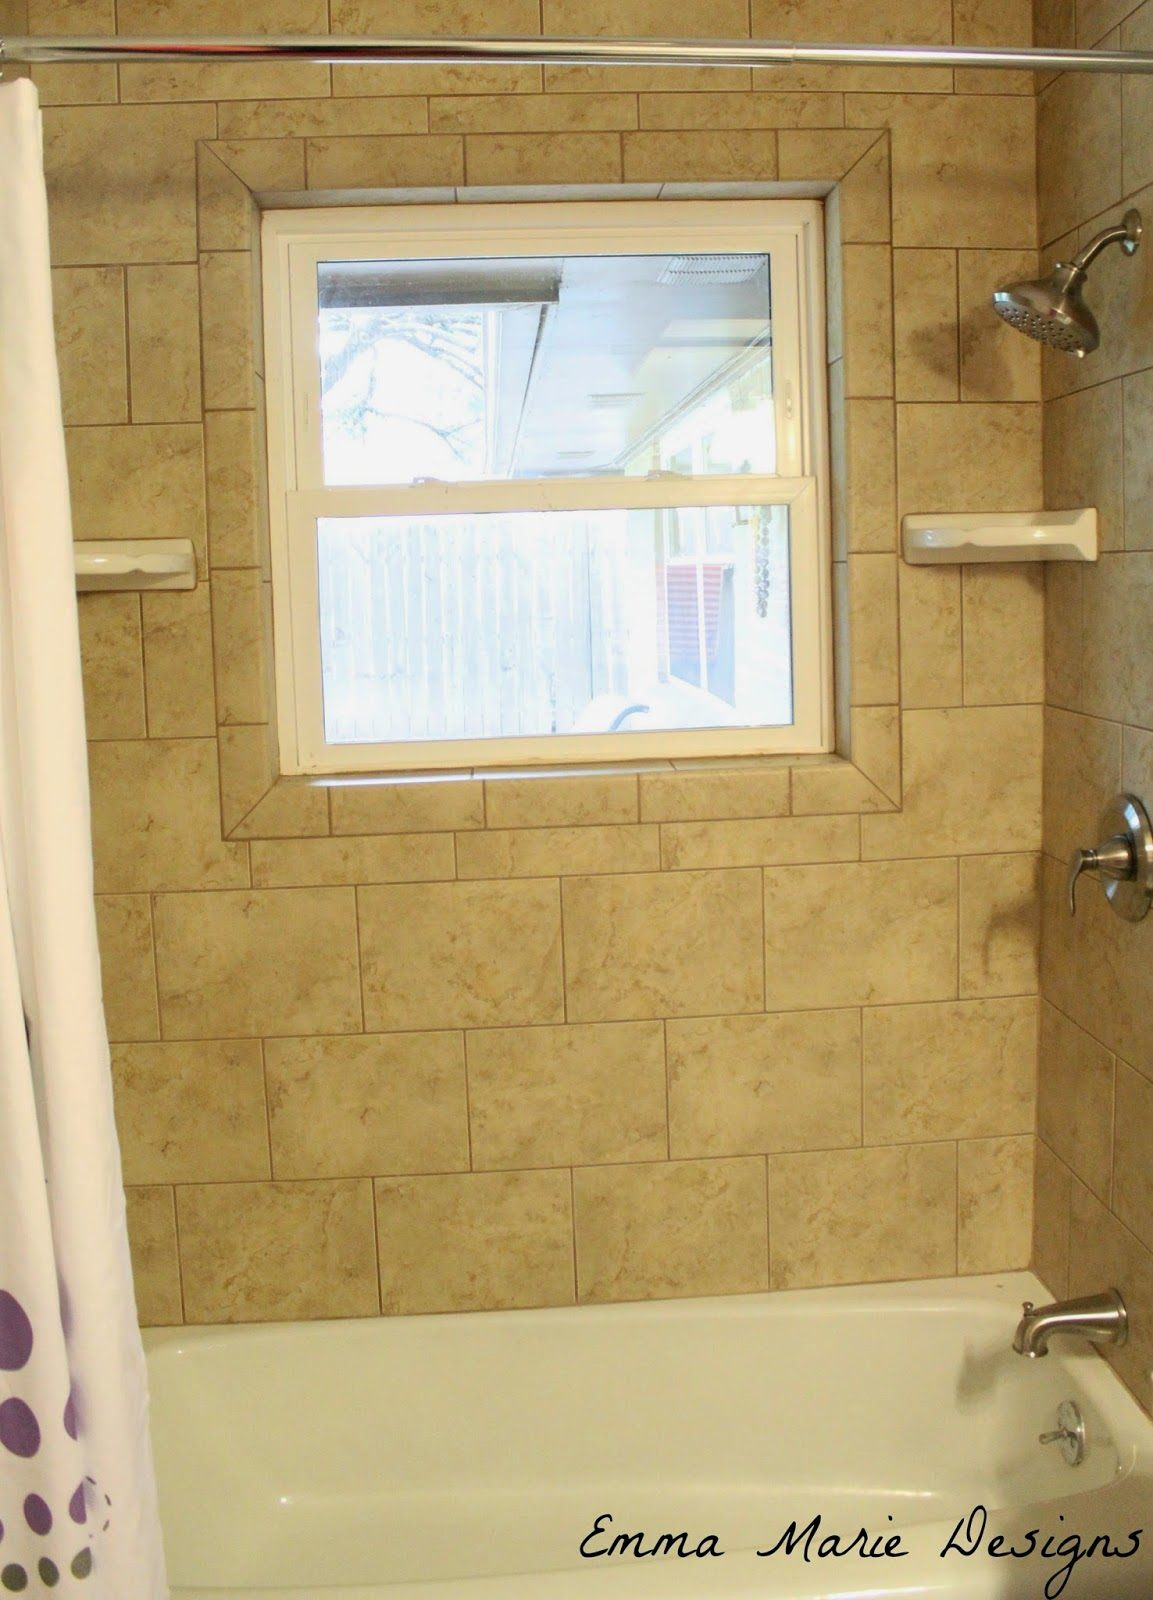 Bedrooms and hall bathroom tour emma marie designs for Hallway bathroom ideas